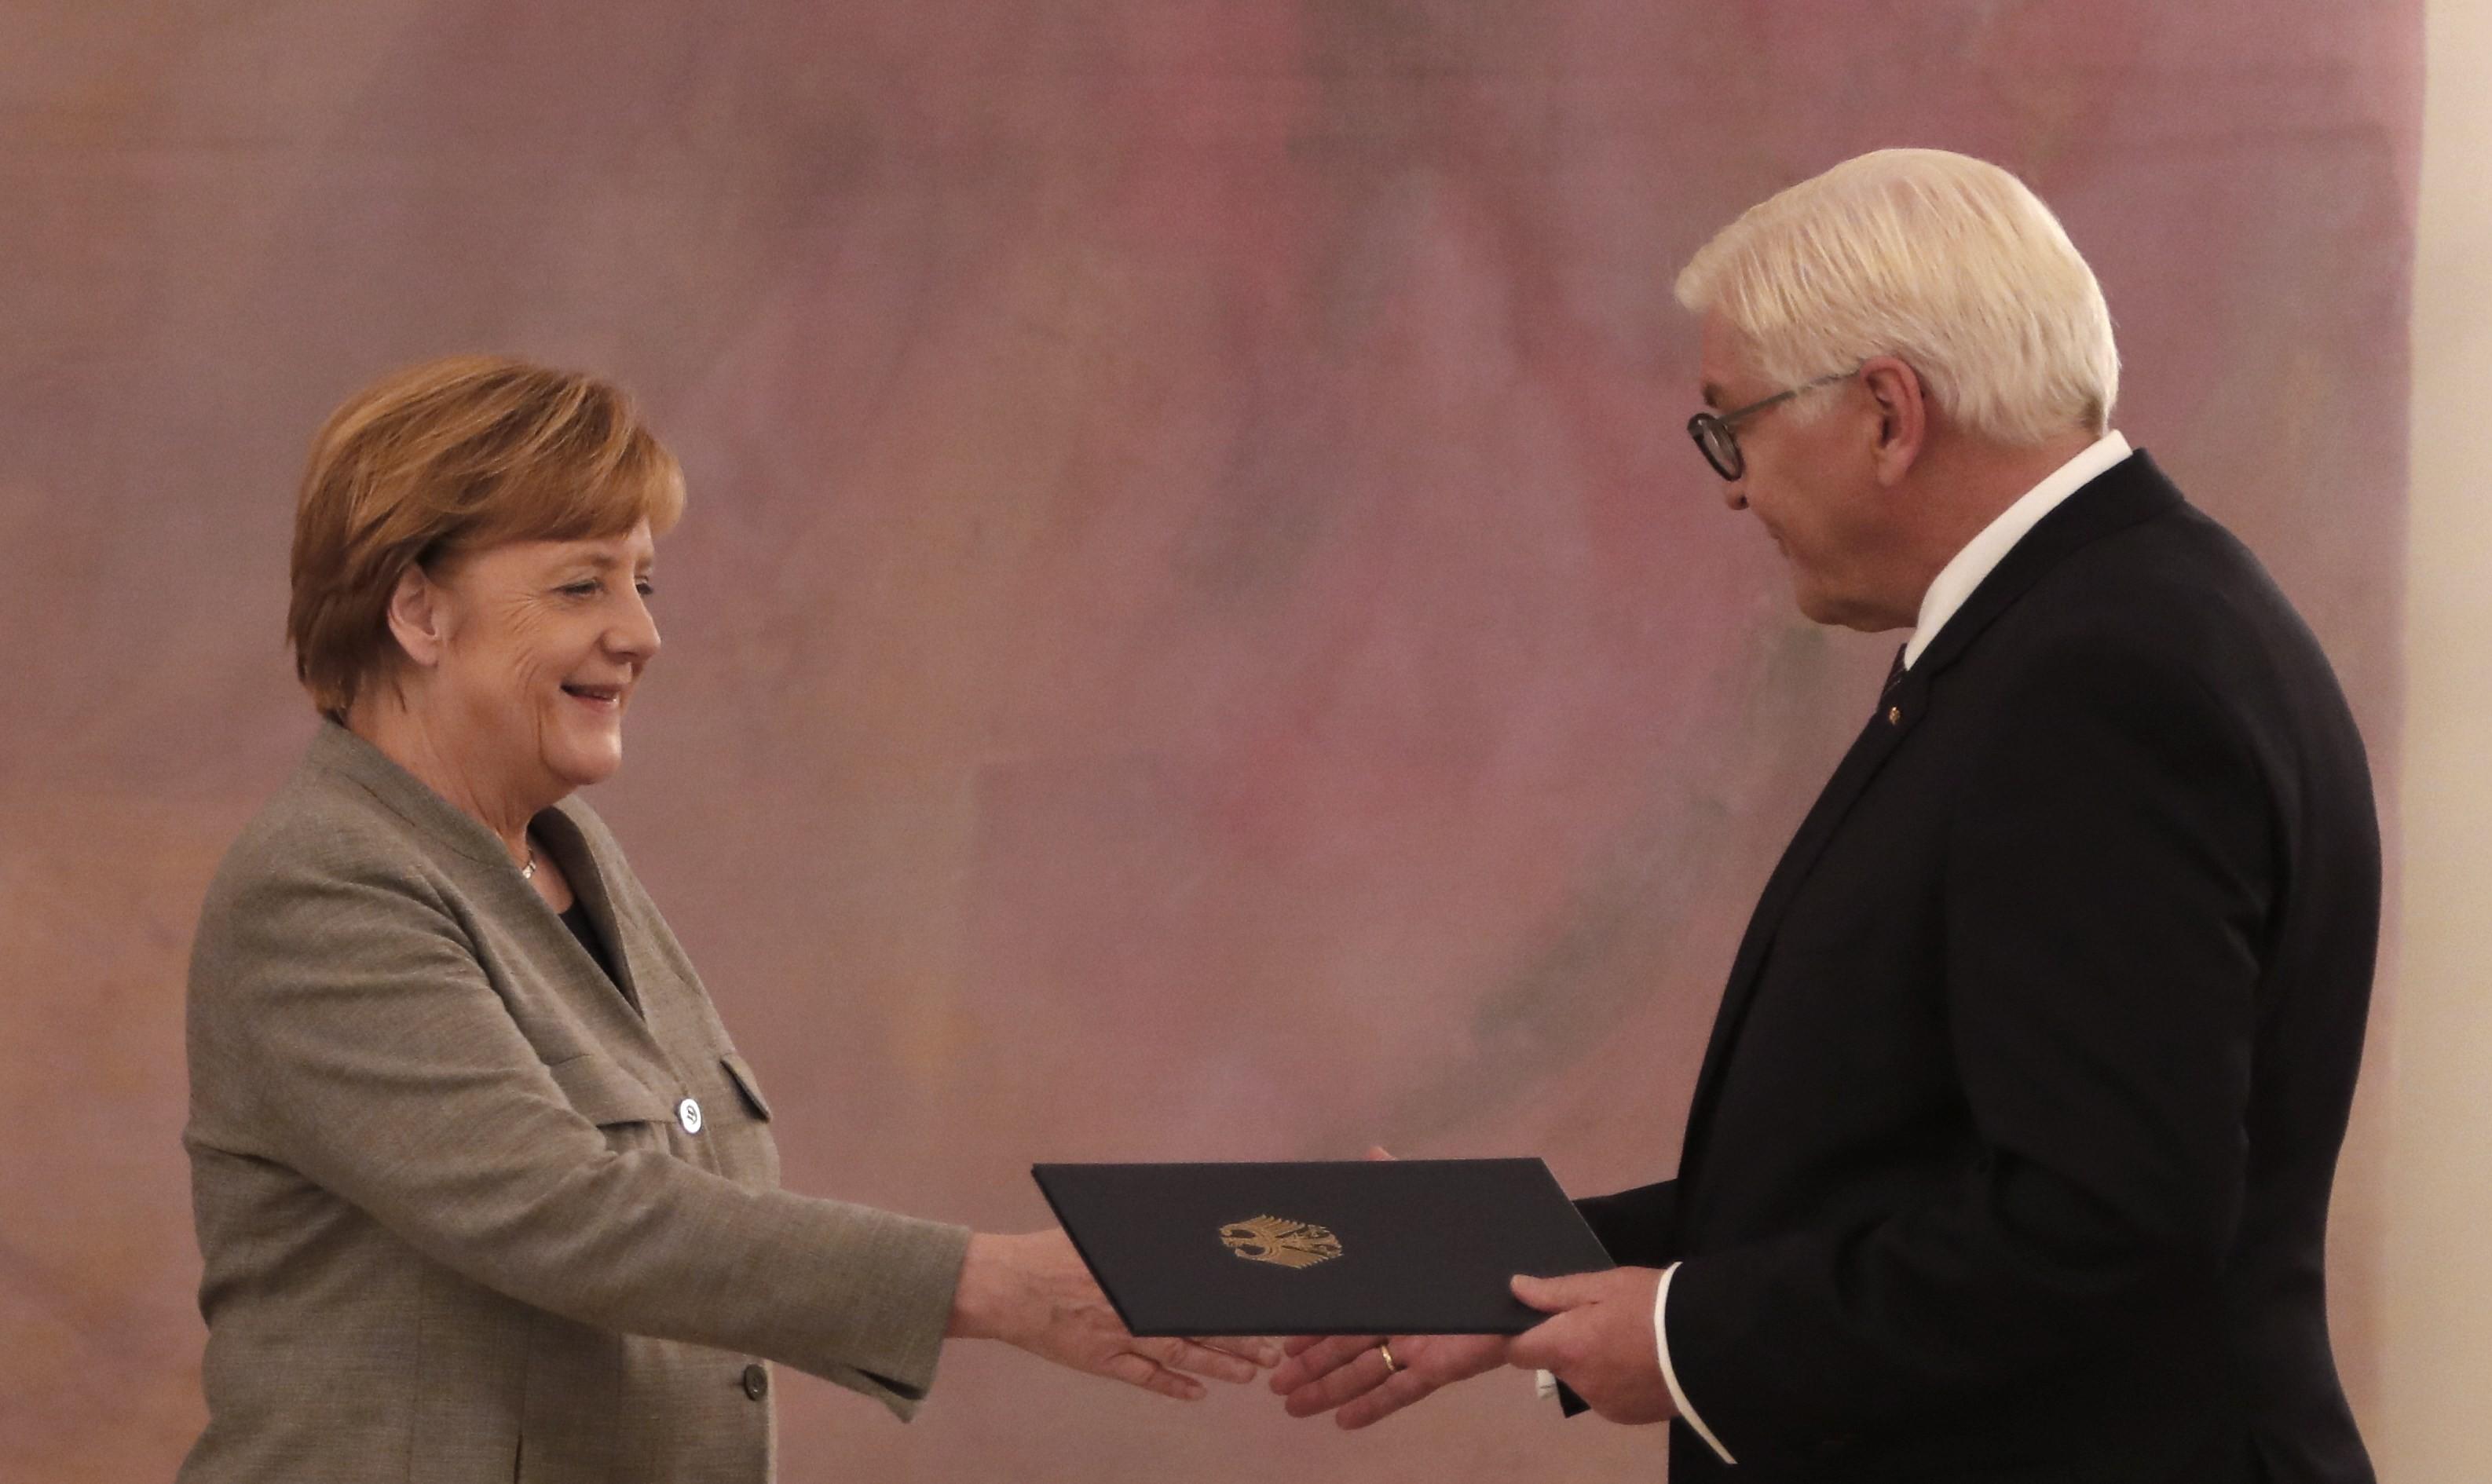 <p><span>Канцлер Германии Ангела Меркель и президент страны Франк-Вальтер Штайнмайер.&nbsp;</span>Фото: &copy;REUTERS/Fabrizio Bensch<span></span></p>